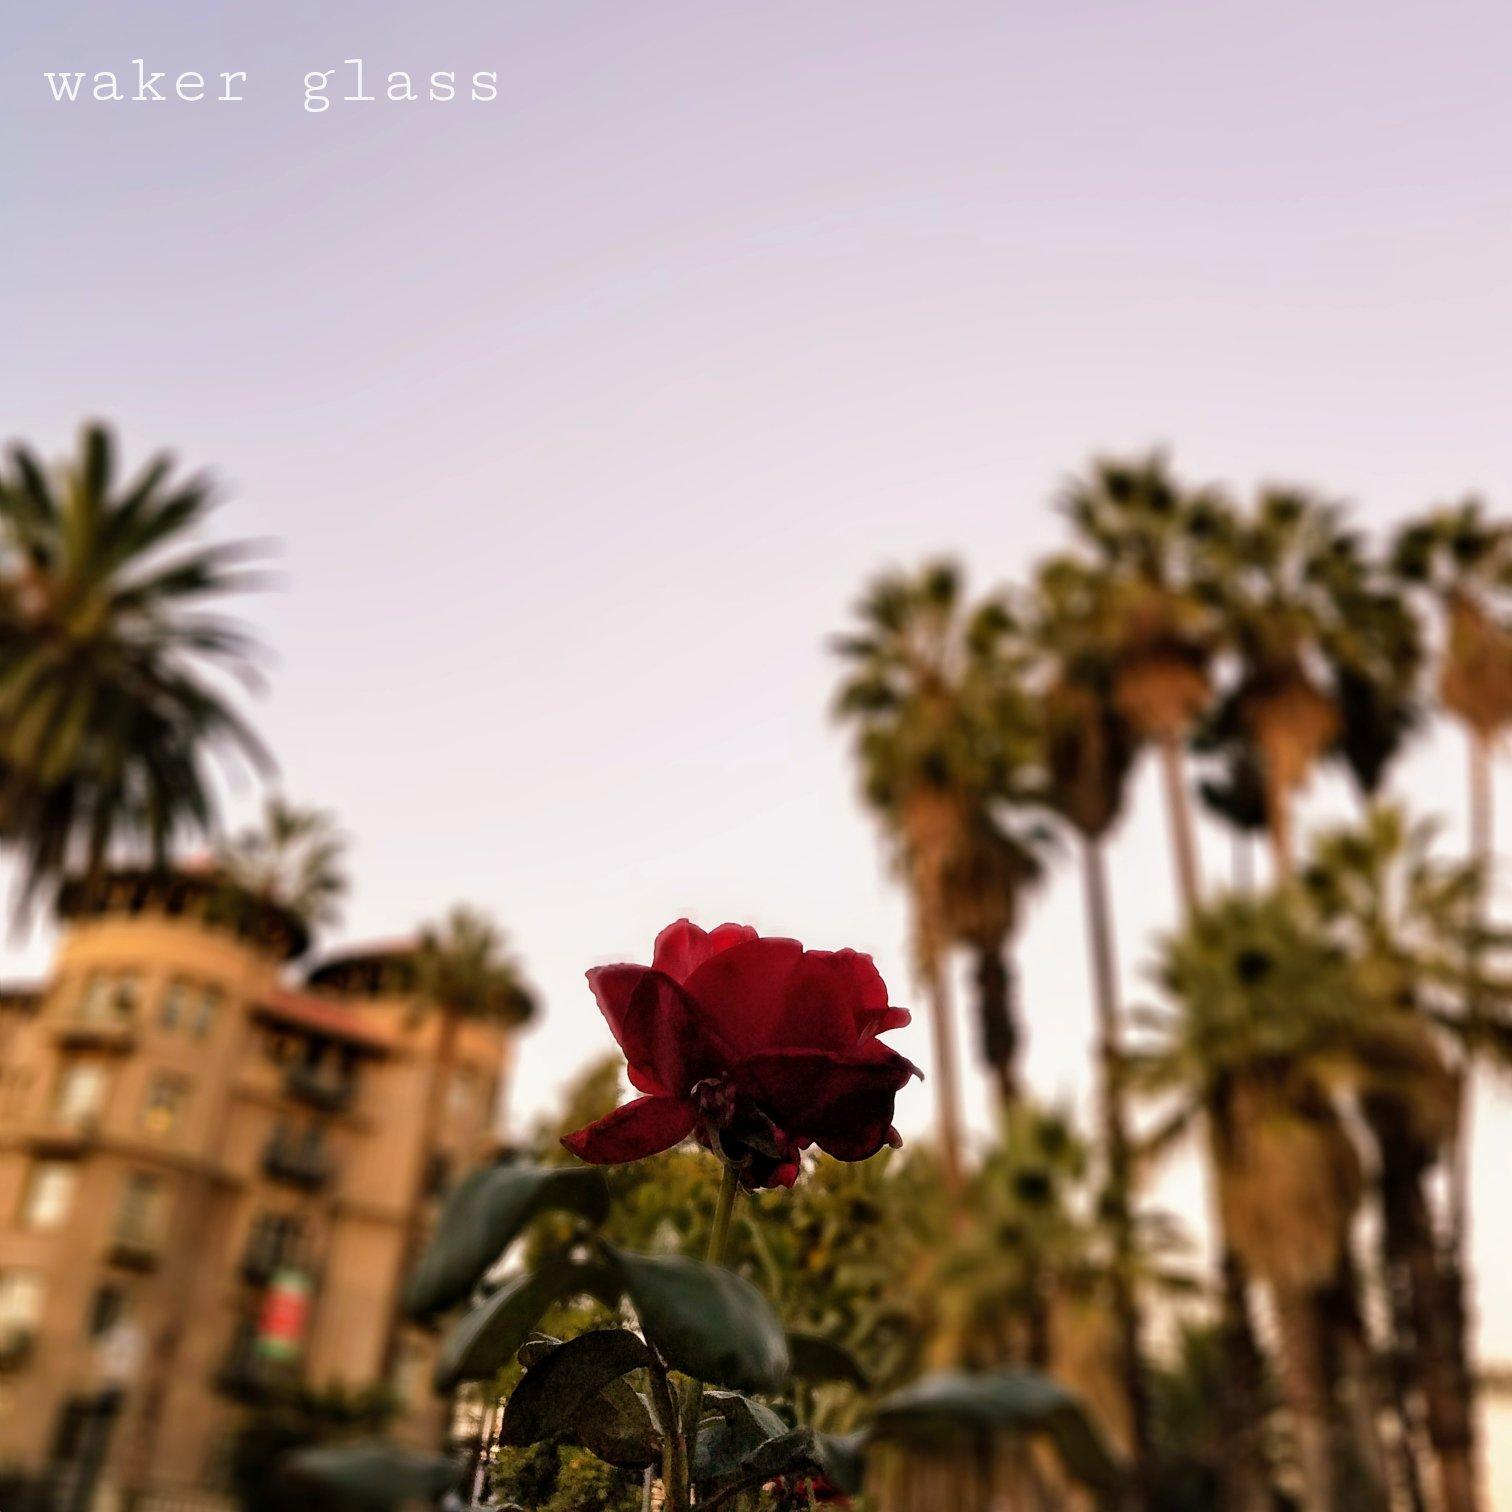 Waker Glass